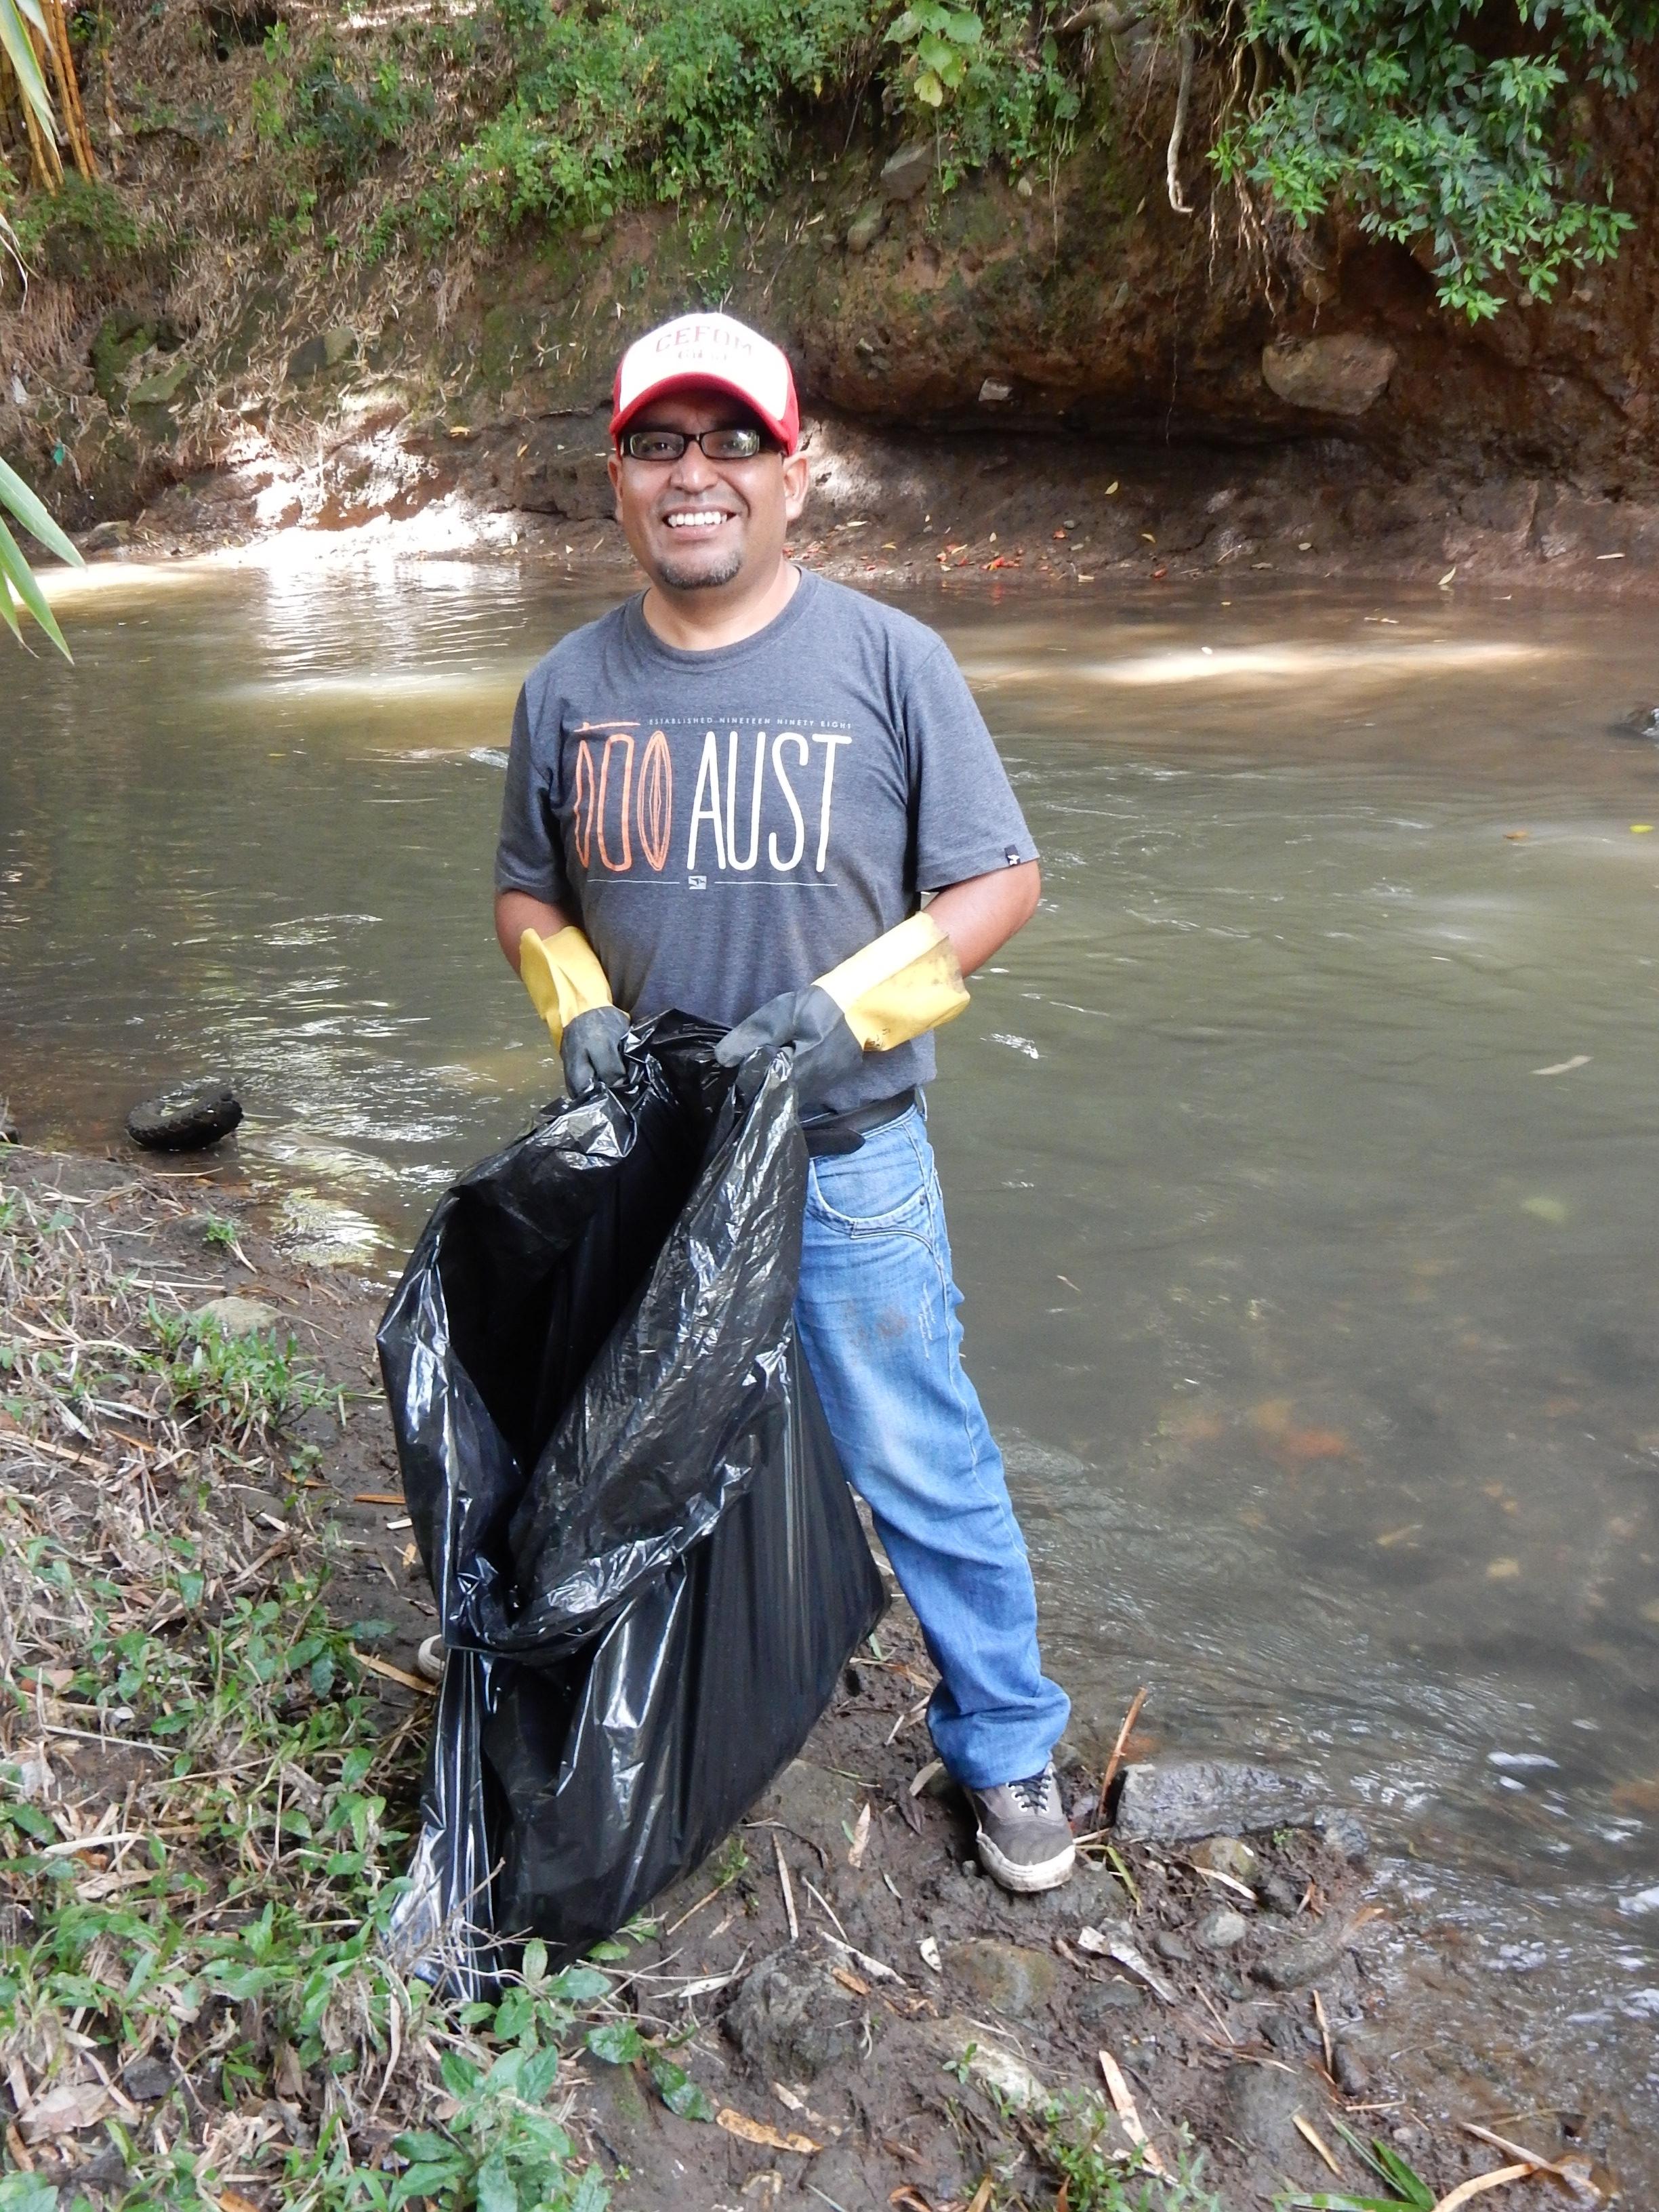 UBL student Ernesto Padilla at the Torres River